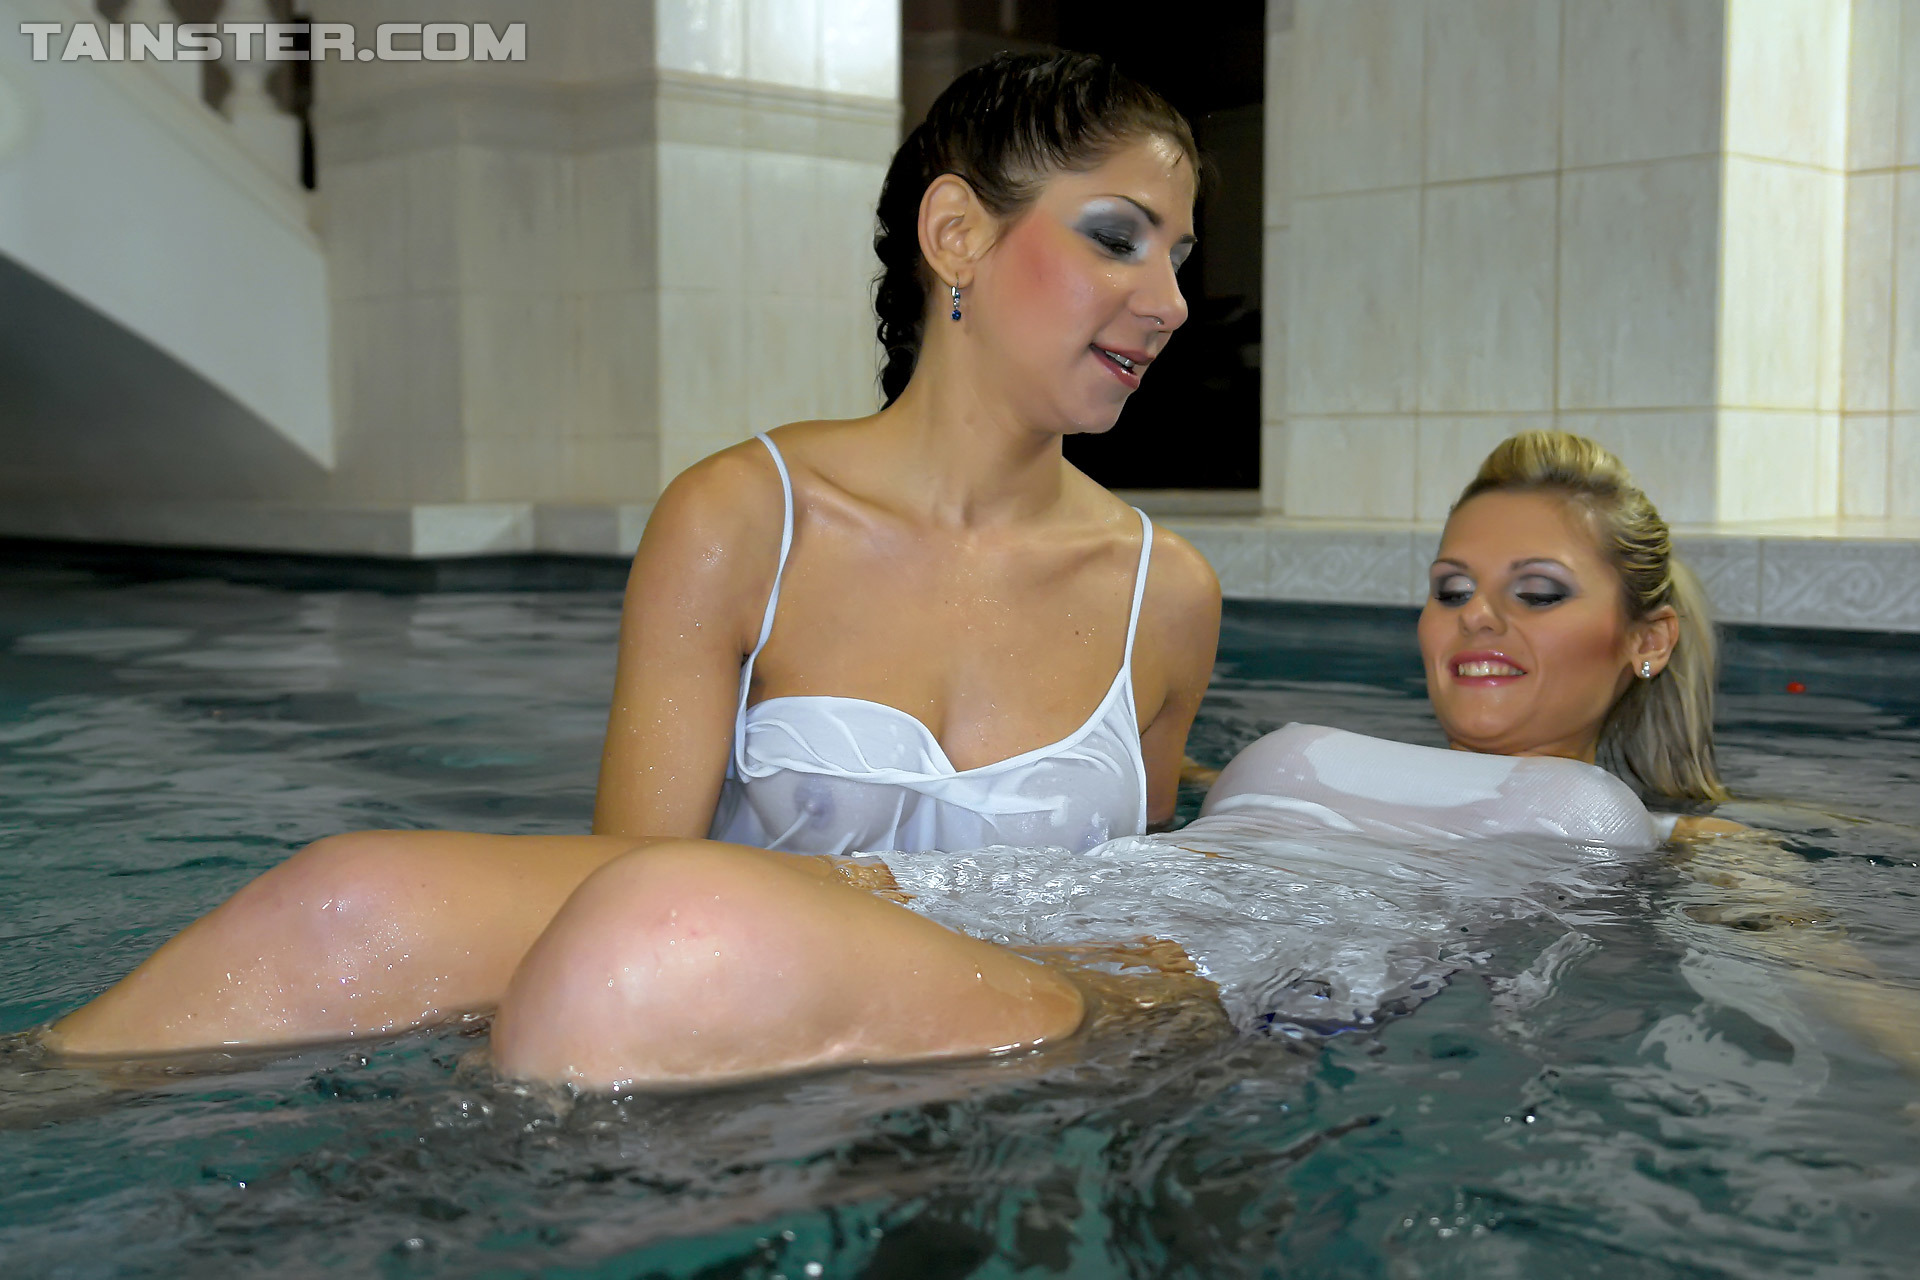 Lesbian Wetlook Pool Fetish